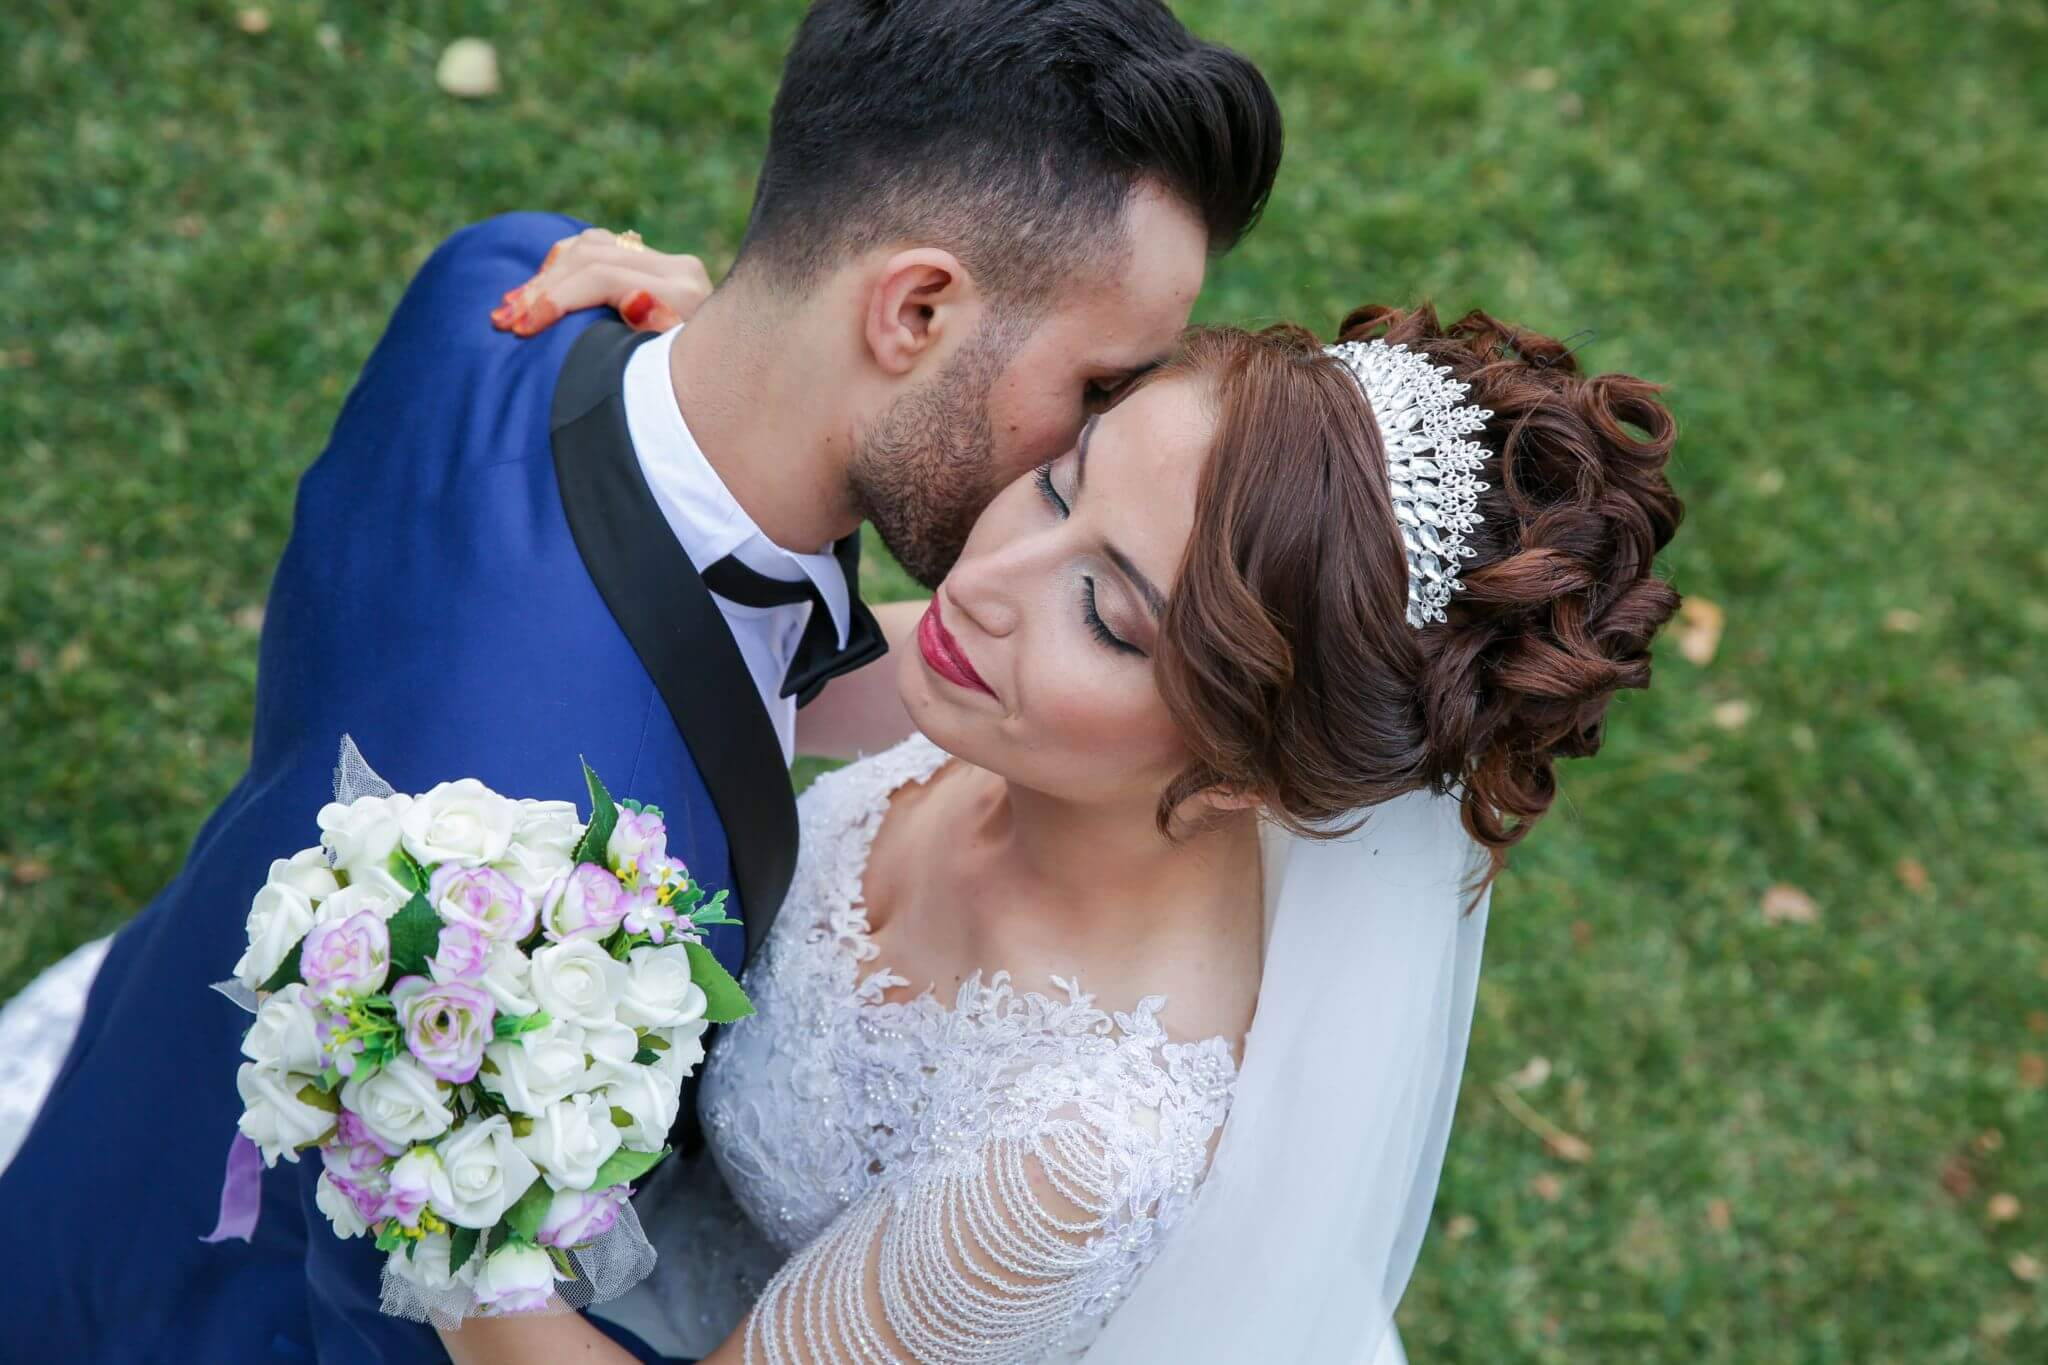 https://sleeklens.com/wp-content/uploads/2020/03/Just-Married-Before.jpg